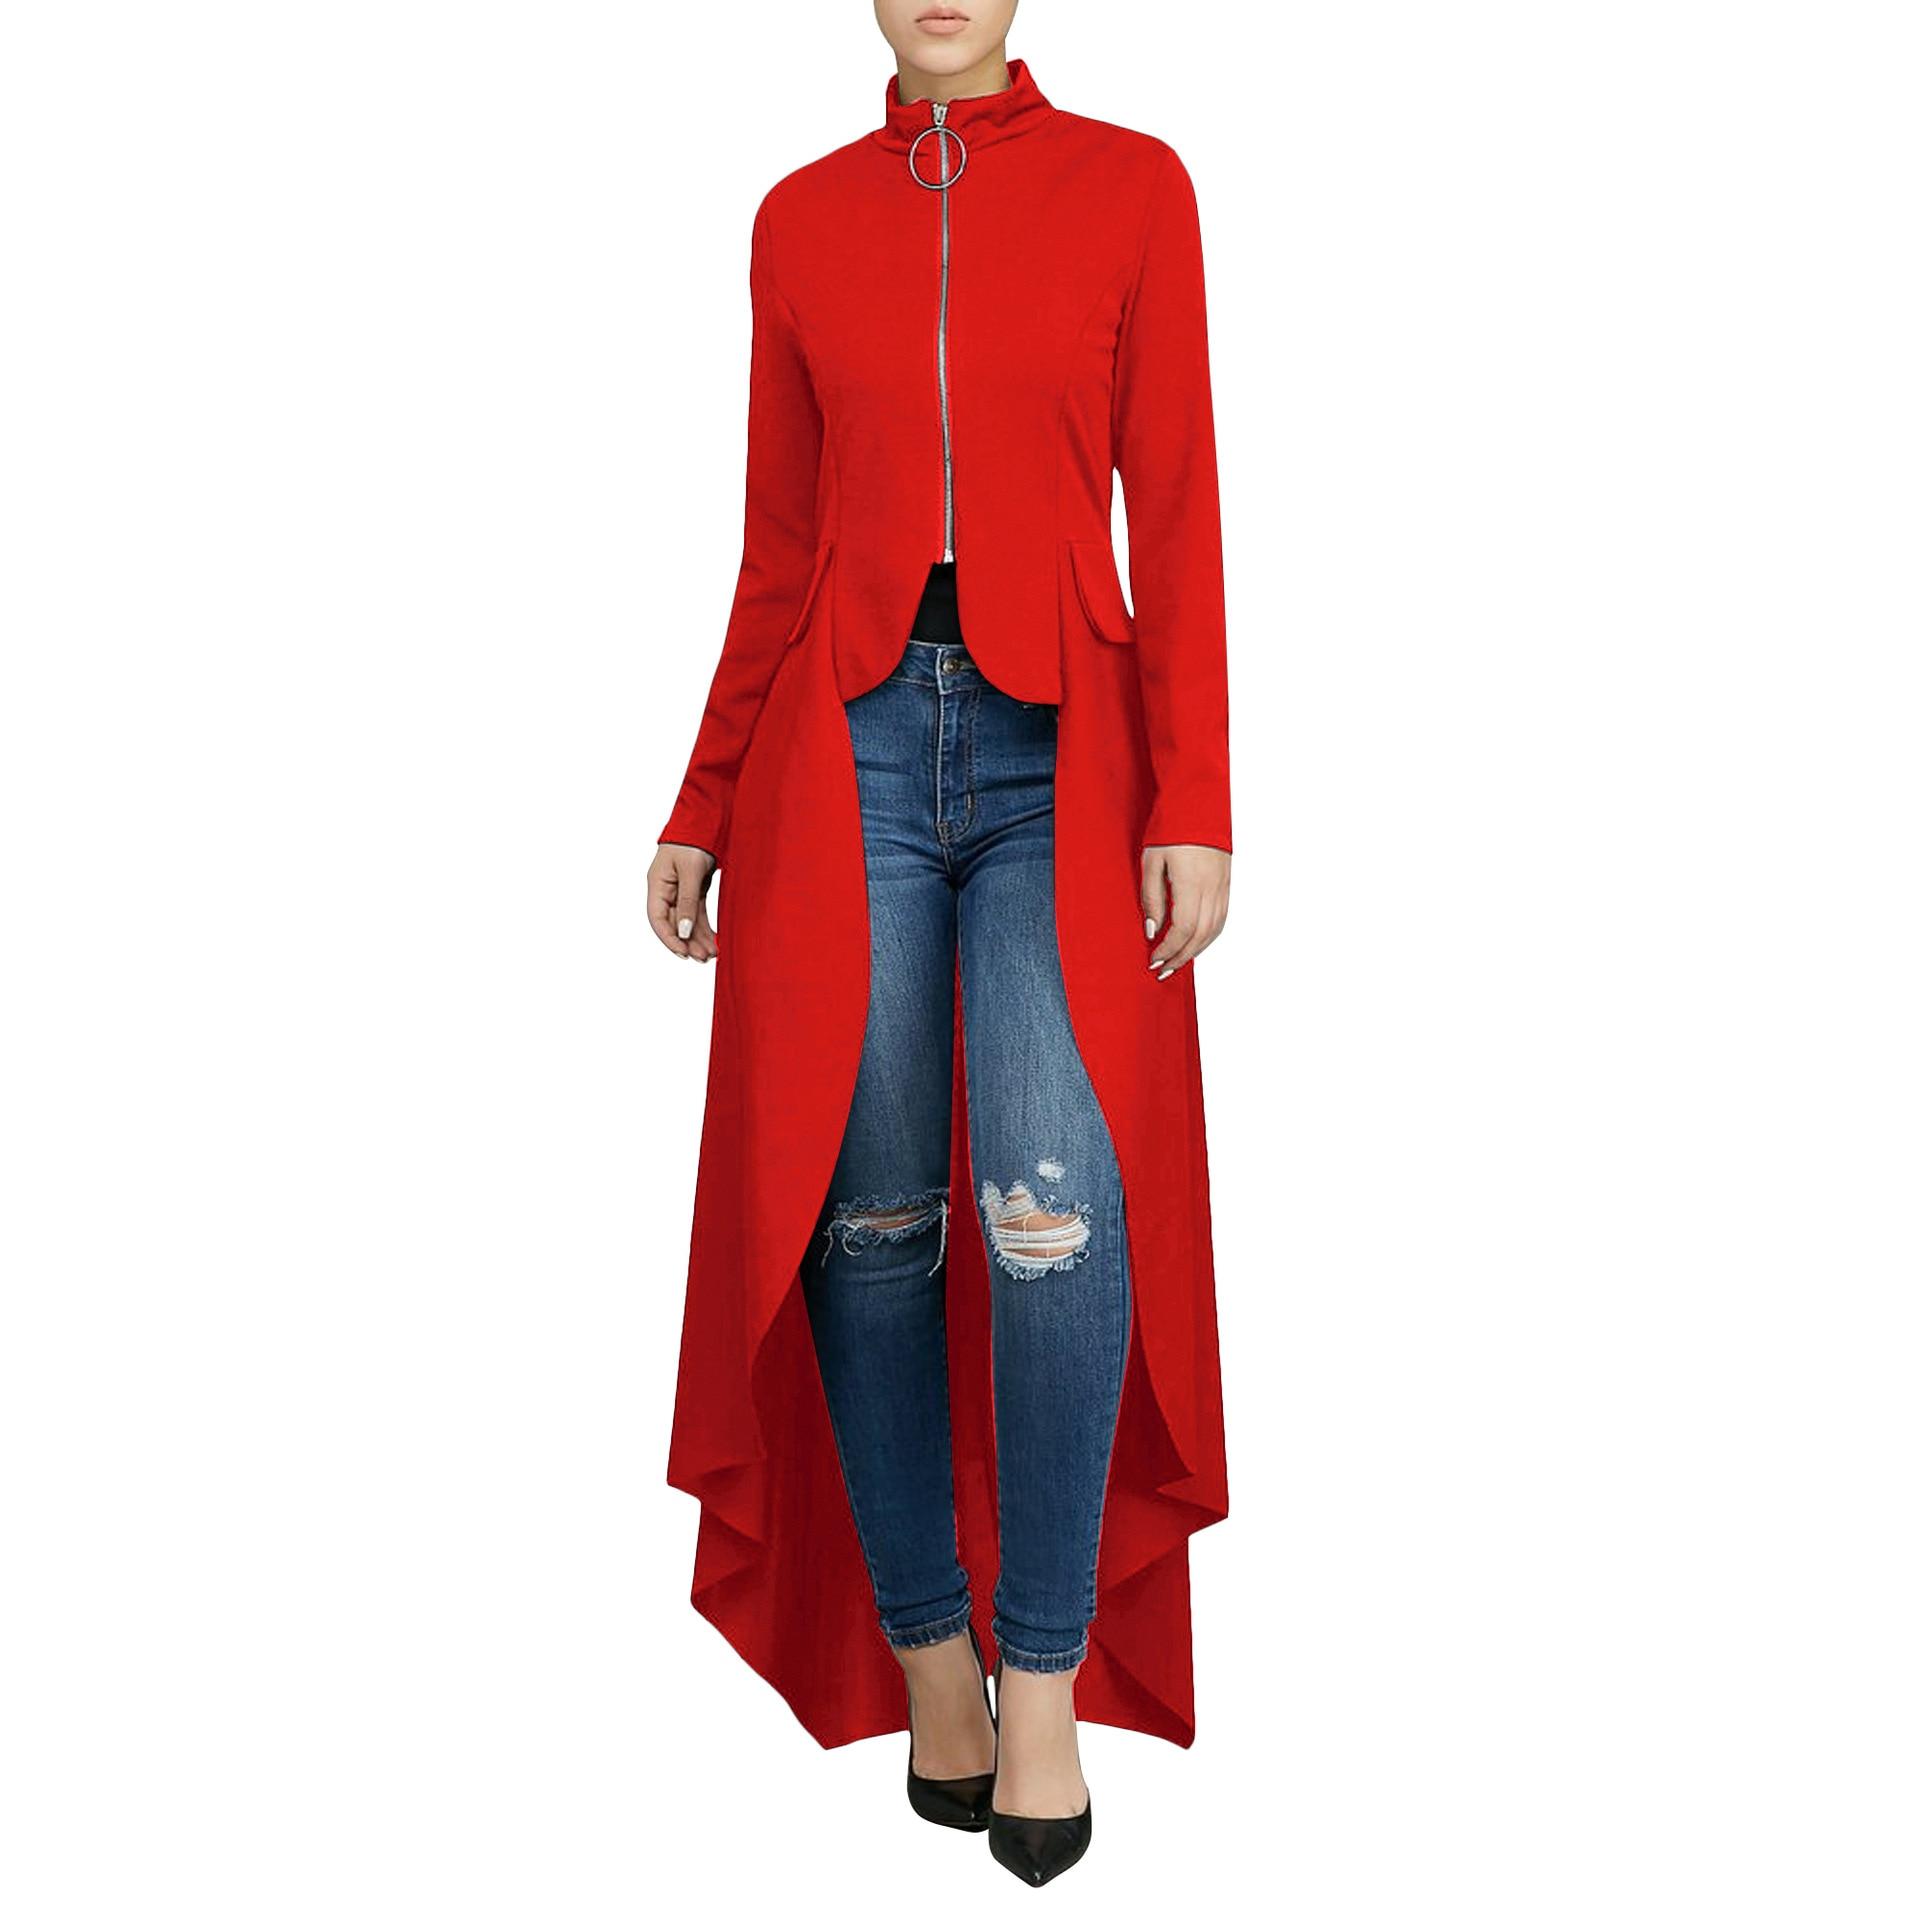 Women Zip Maxi Tunic Loose Blouse Ladies Autumn Stylish Elegant Long Sleeve High Low  Top Plus Size 7 Colors